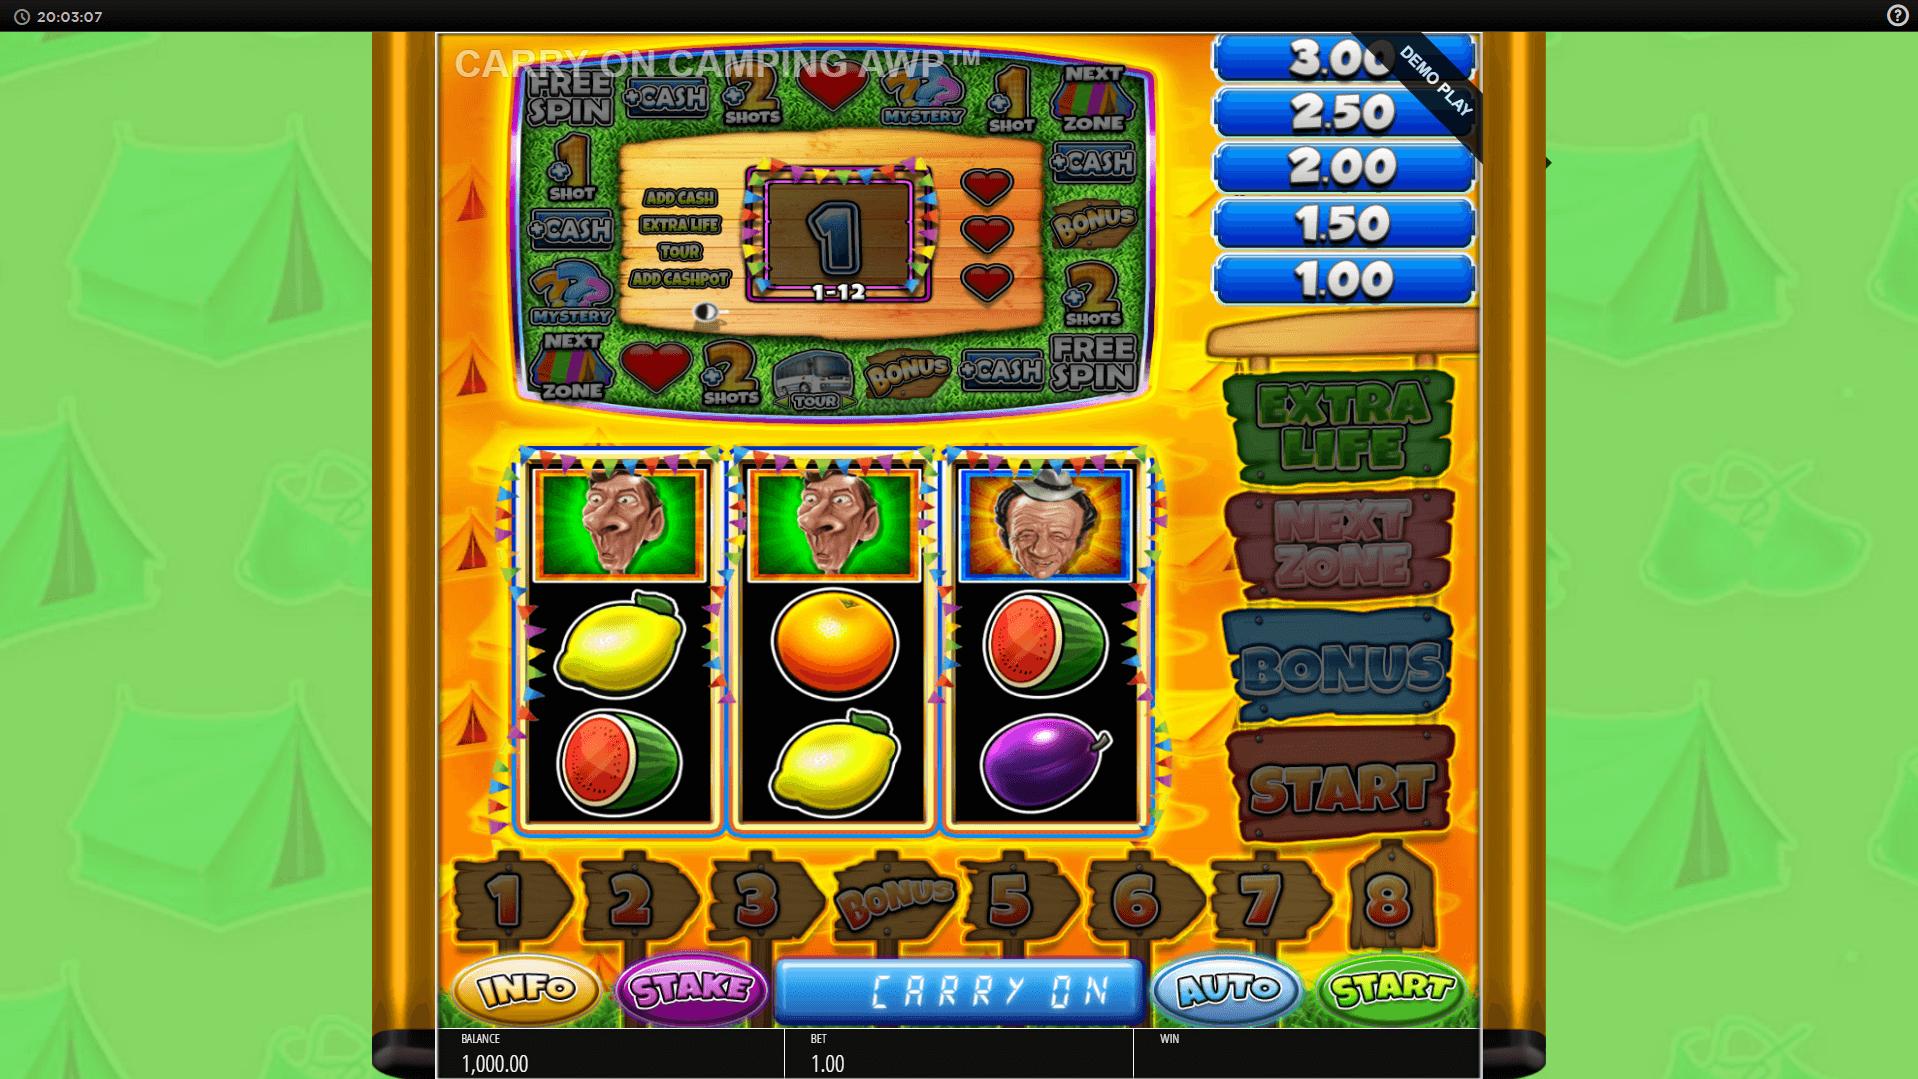 Carry On Camping Pub Fruit slot machine screenshot